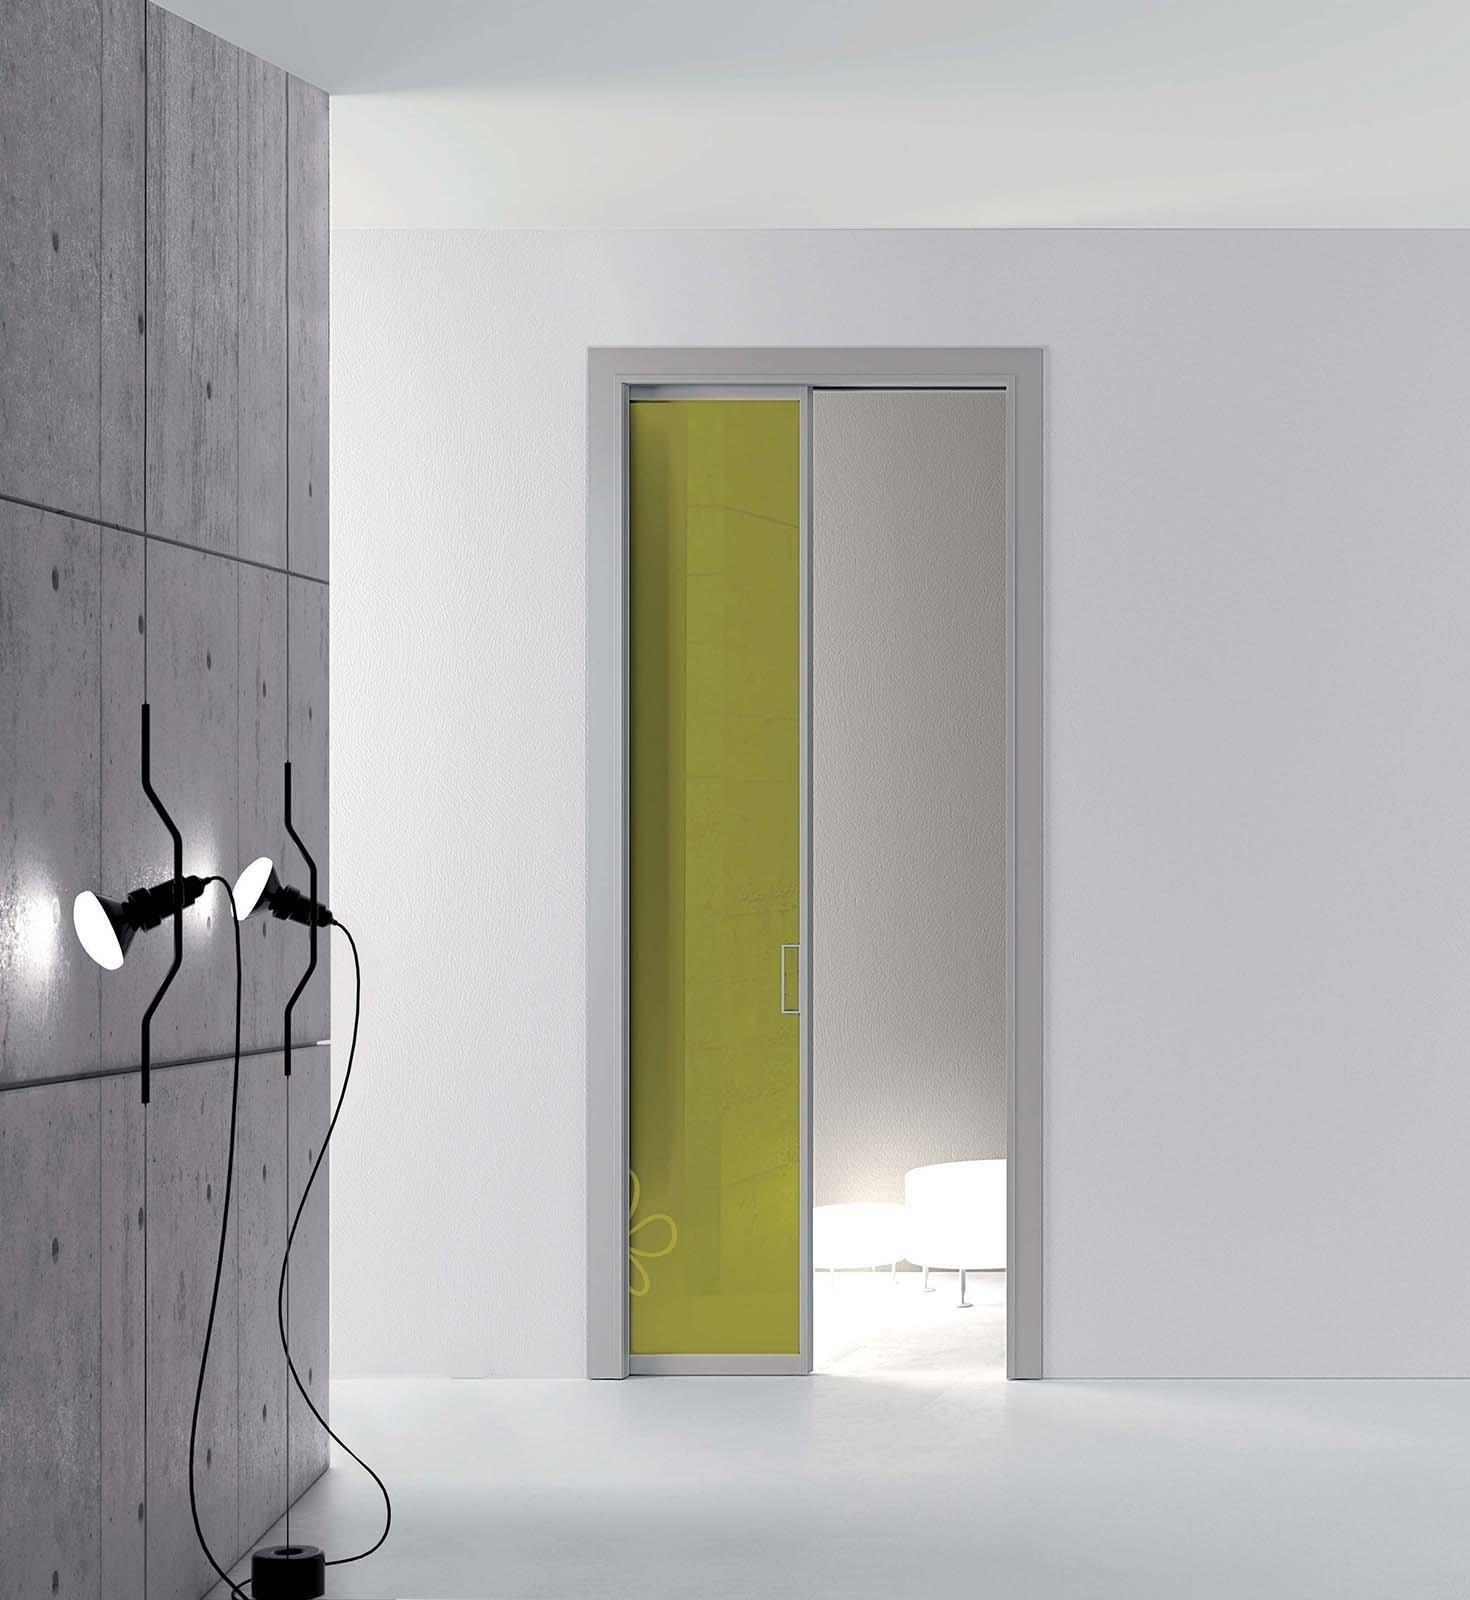 Porte scorrevoli in vetro a scomparsa o esterno muro cose di casa - Porte scorrevoli da esterno ...